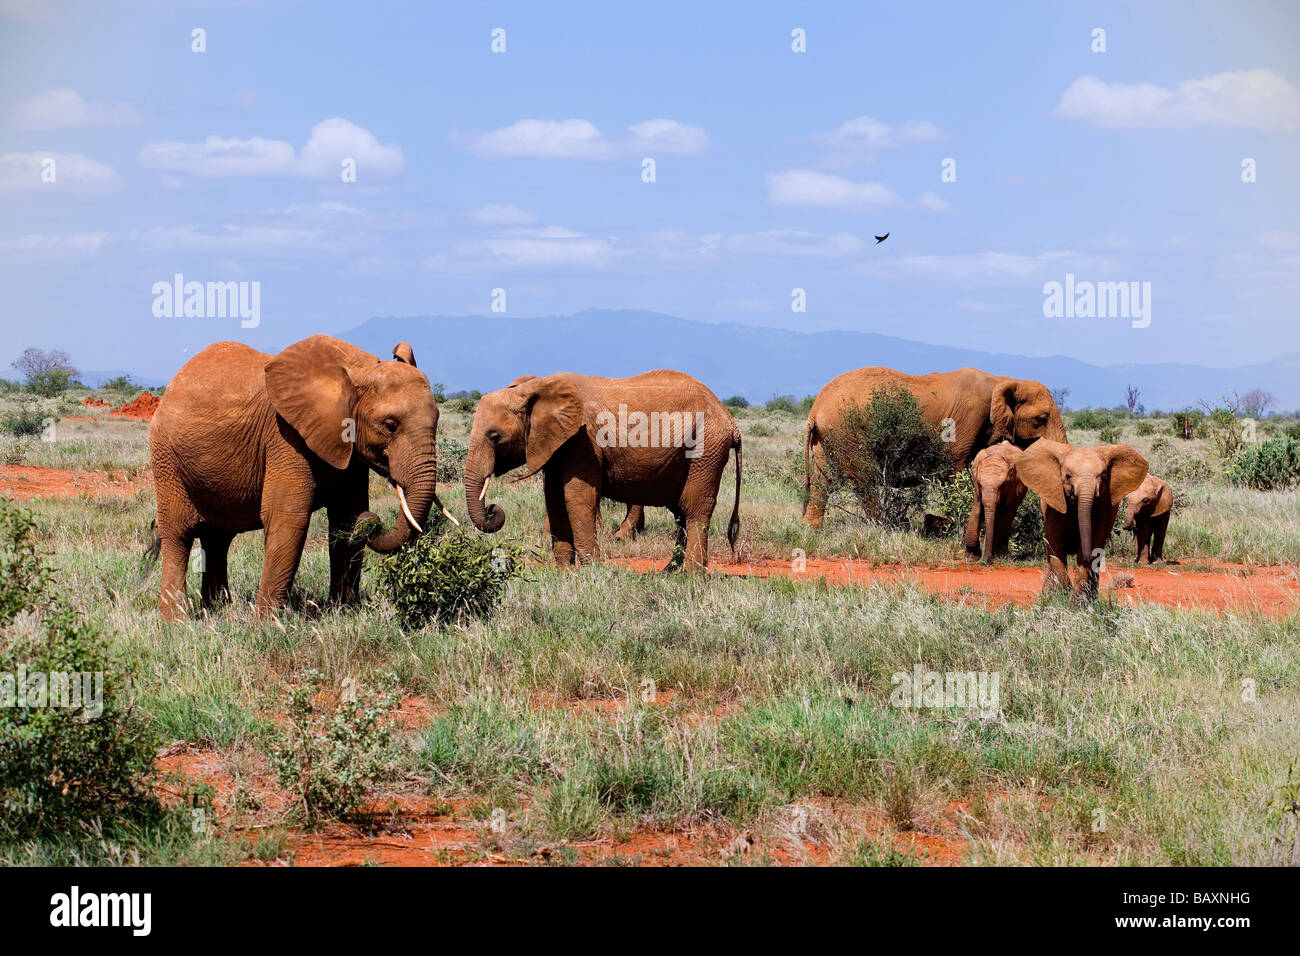 Family of African Bush Elephants in savannah, Tsavo East National Park, Coast, Kenya - Stock Image